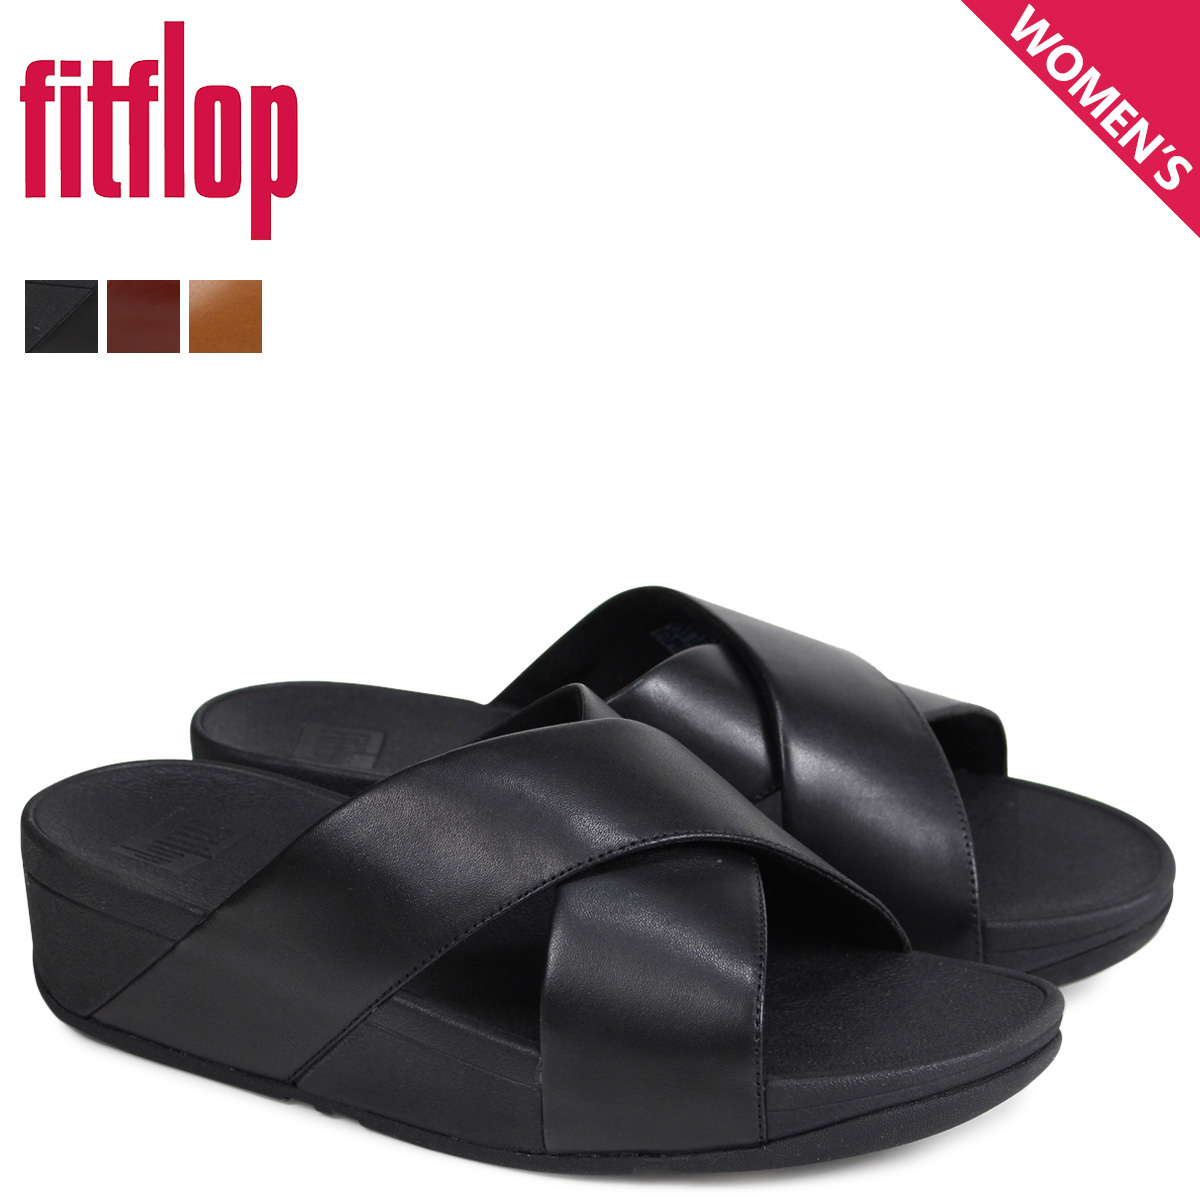 e6be4d2b2109a4 FitFlop sandals fitting FLOP Lulu LULU CROSS SLIDE SANDALS Lady s K04 black  brown  4 4 Shinnyu load